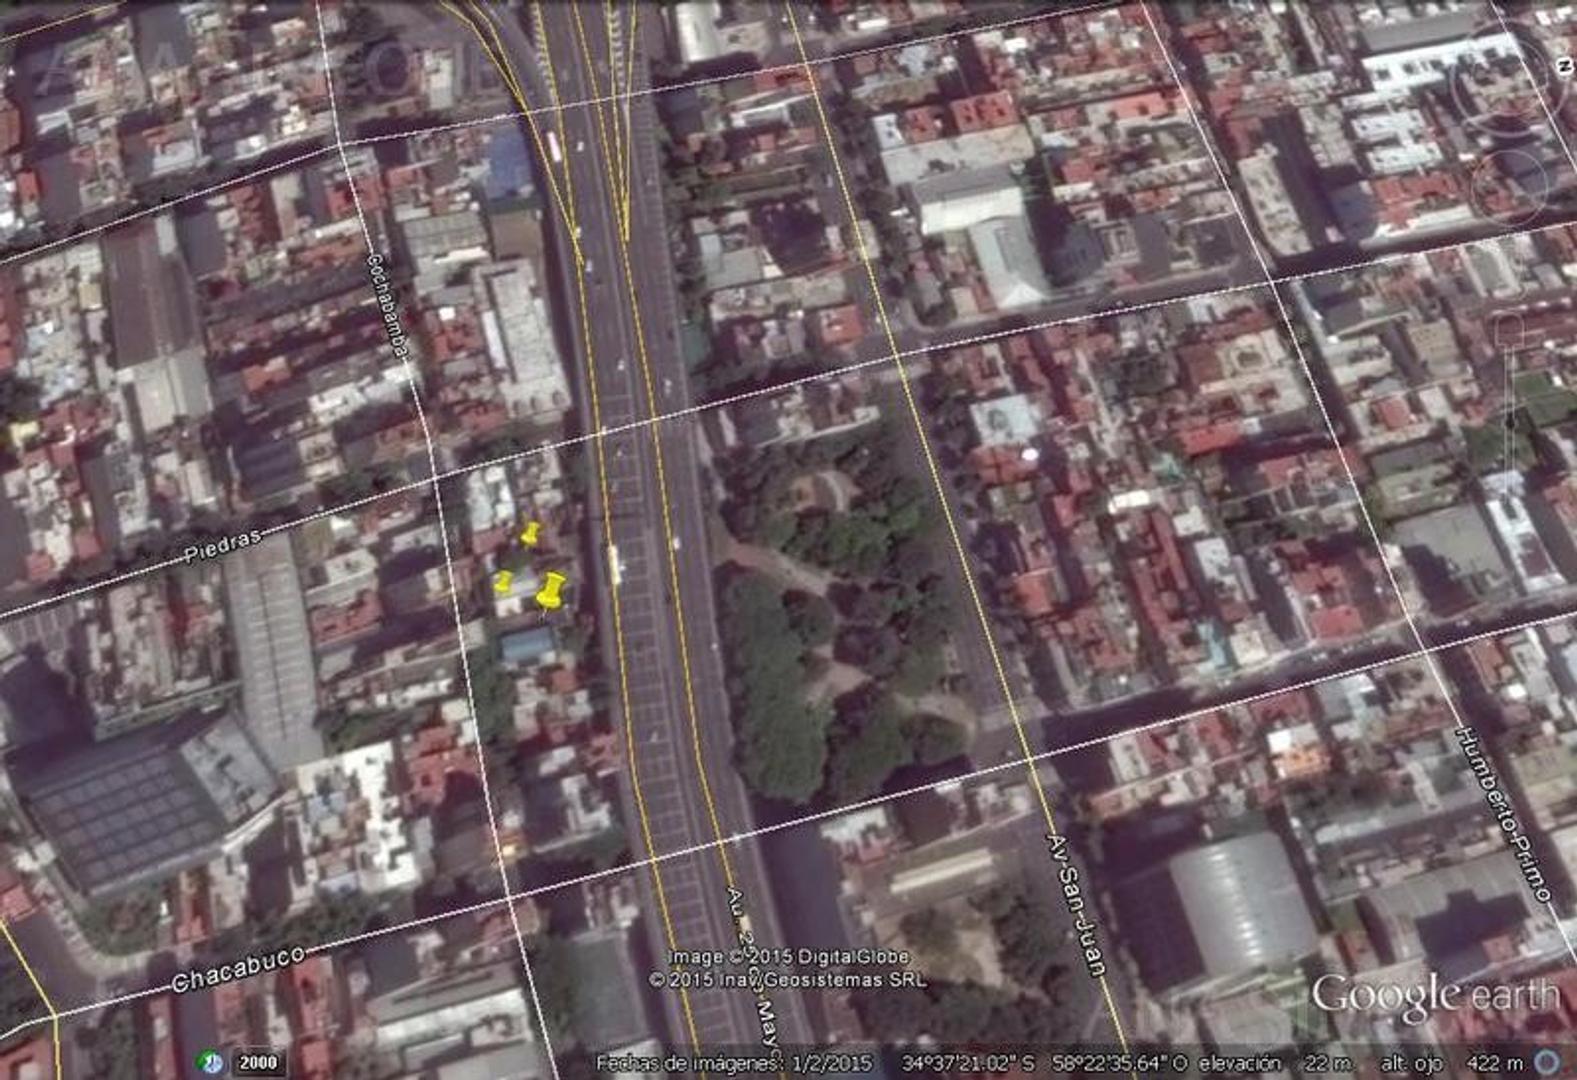 Local - San Telmo - Galpón Comercial/ Local/ Terreno  de 6,50 m x 28 m, de chapa de 4,5 m de altura